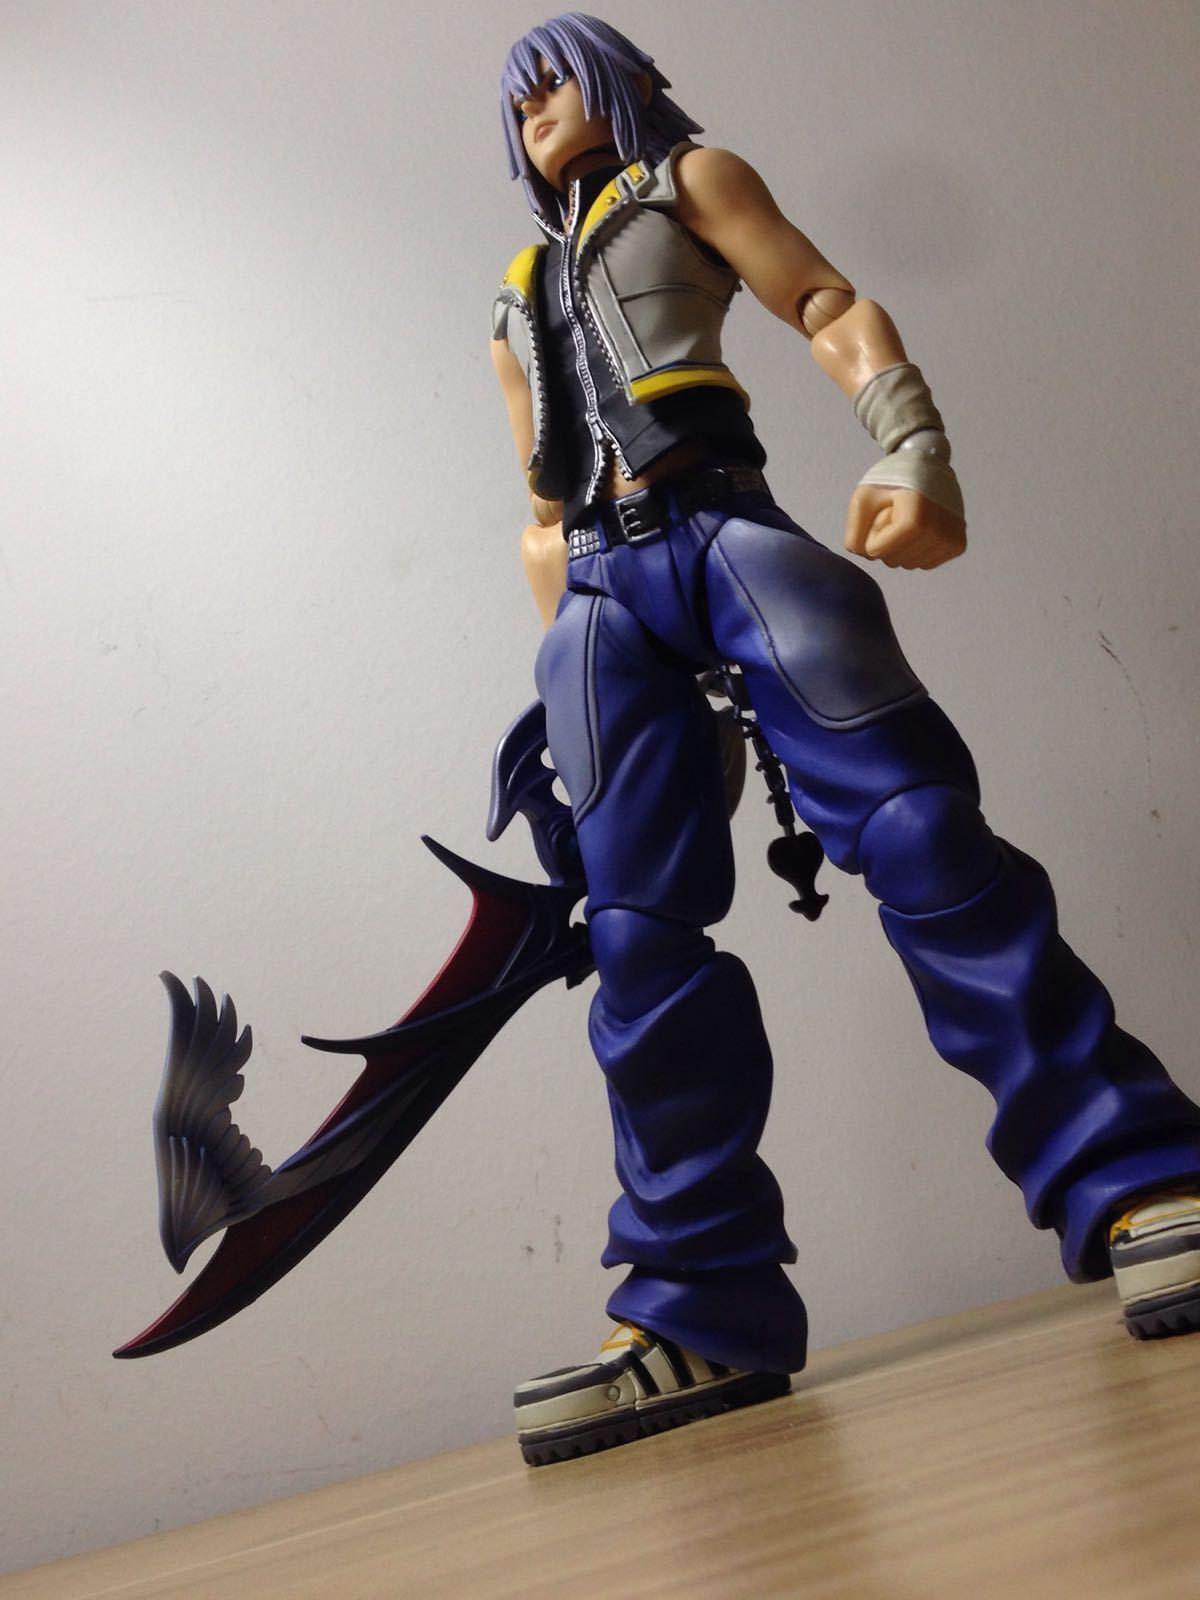 Original Square Enix Play Arts Kai Kingdom Hearts 2 Riku Action Figure(no box)